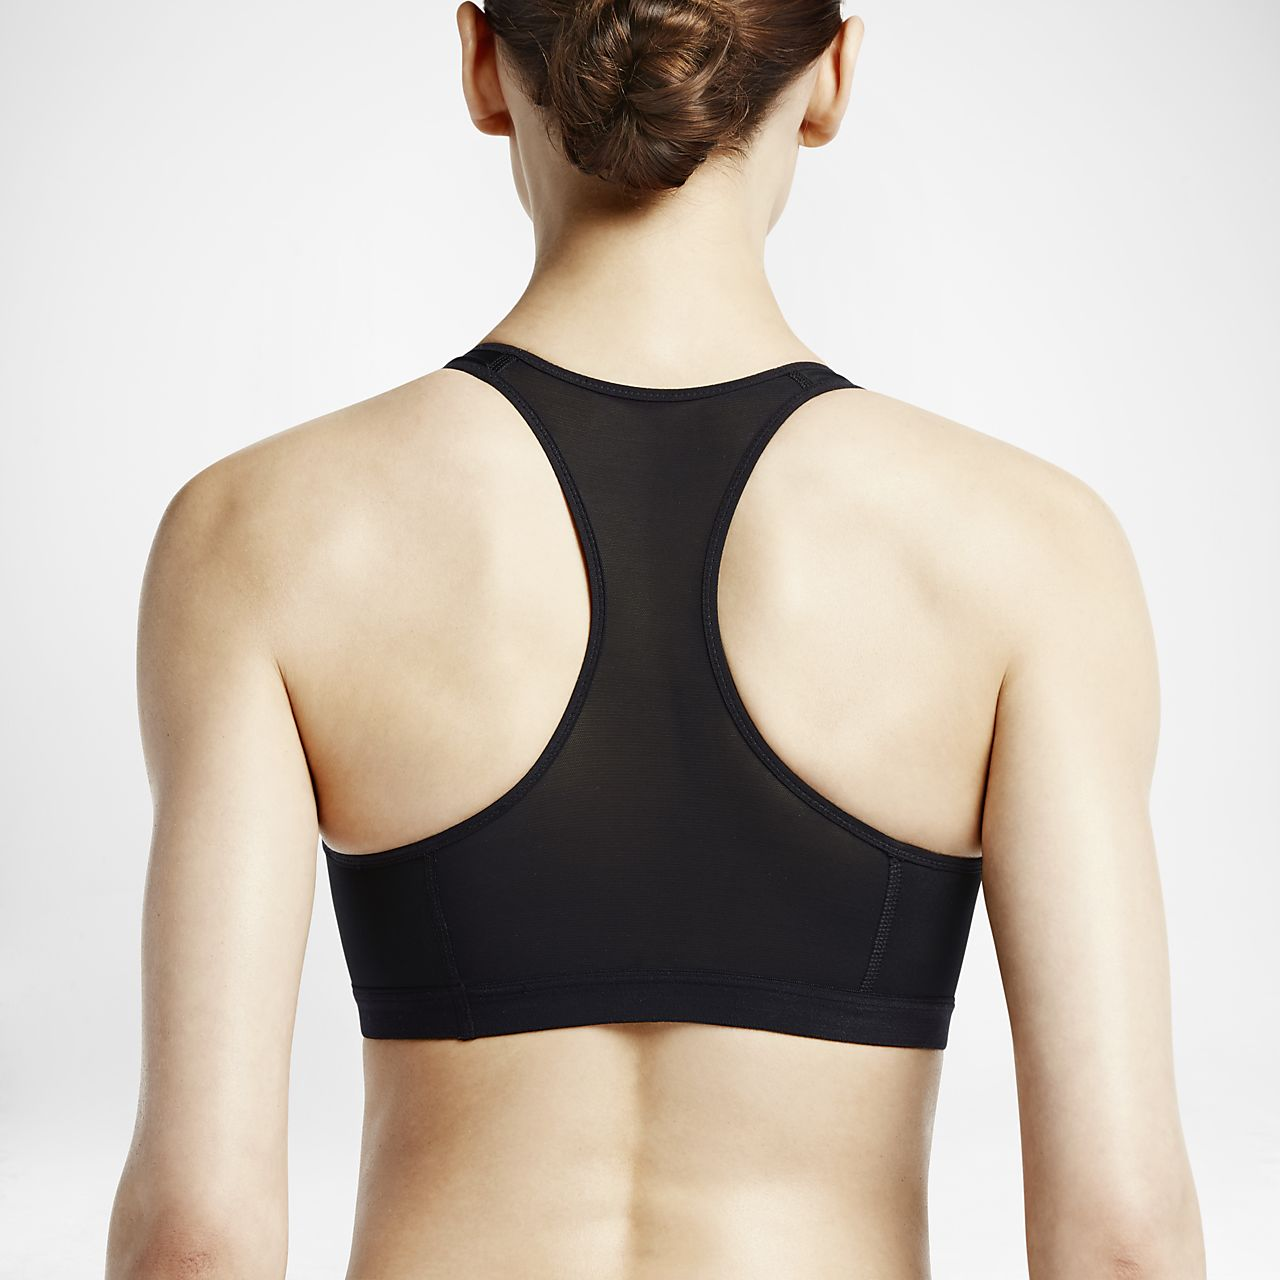 Nike Performance Pro Fierce Sports Bra Black : Hn5968